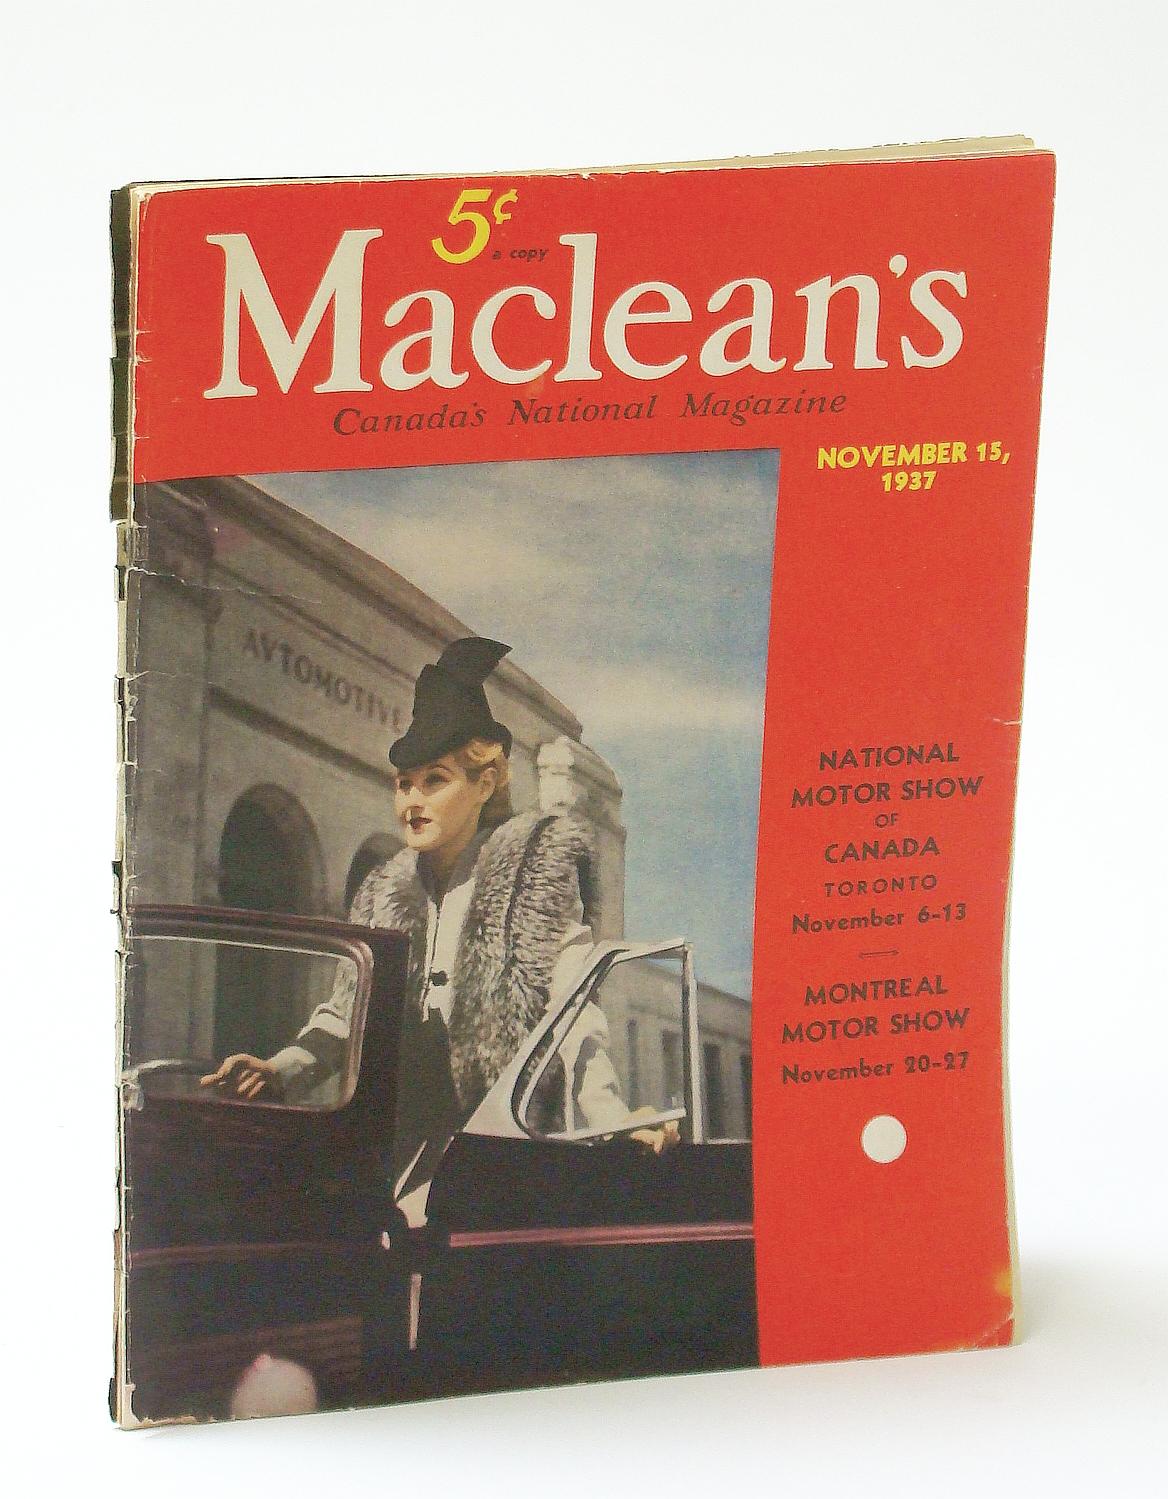 Image for Maclean's, Canada's National Magazine, November (Nov.) 15, 1937 - Motor Shows in Toronto and Montreal / N.H.L. President Frank Calder